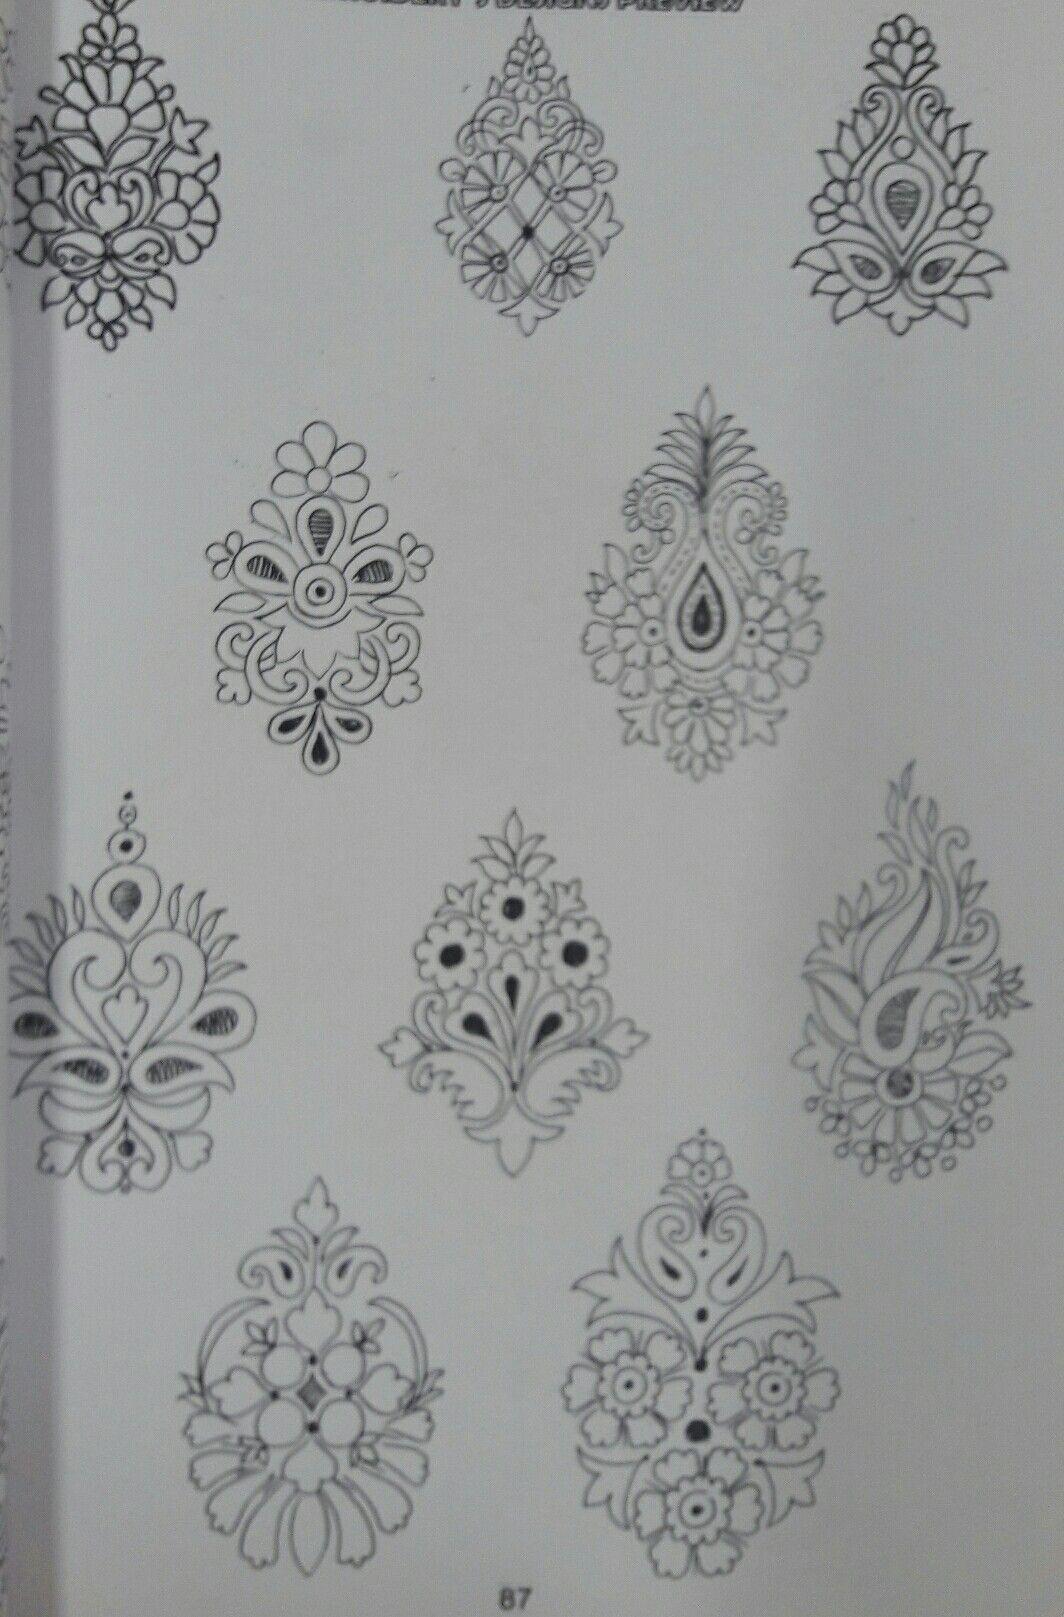 Best Art Hand Embroidery Designs Hand Embroidery Design Patterns Border Embroidery Designs